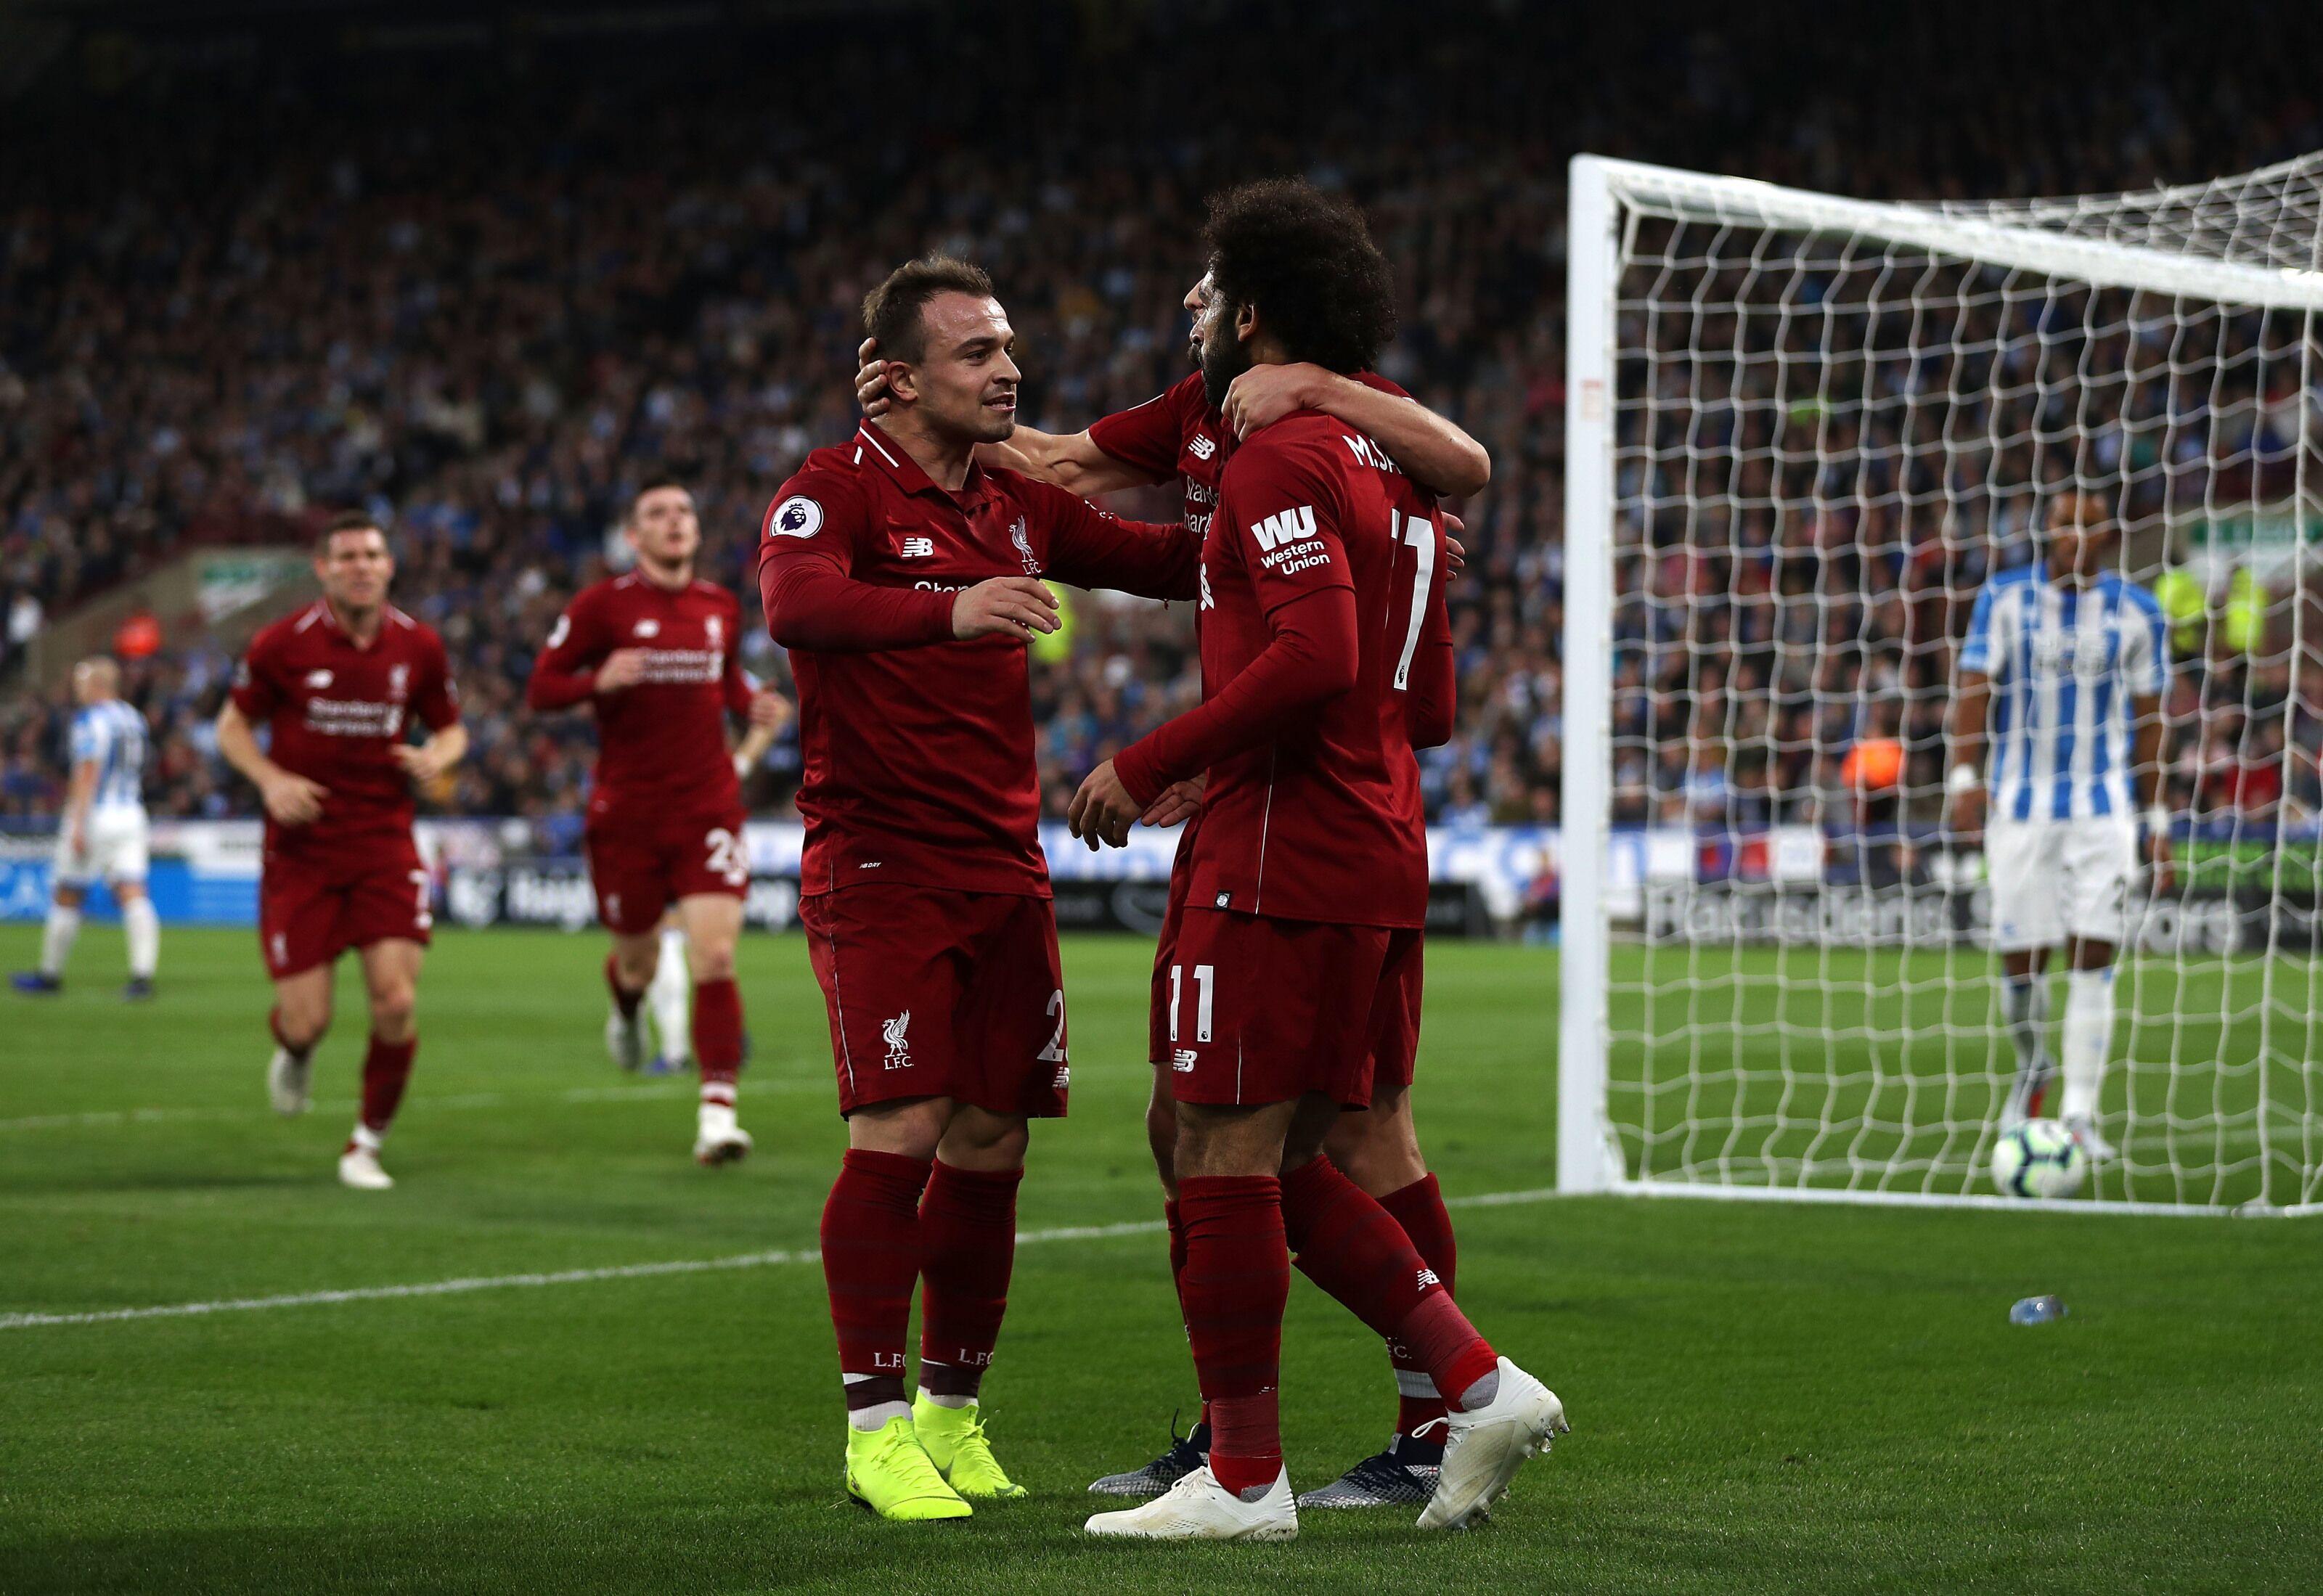 Liverpool vs Huddersfield: Dejan Lovren 'bizarre', Xherdan Shaqiri 'buzzed about'?